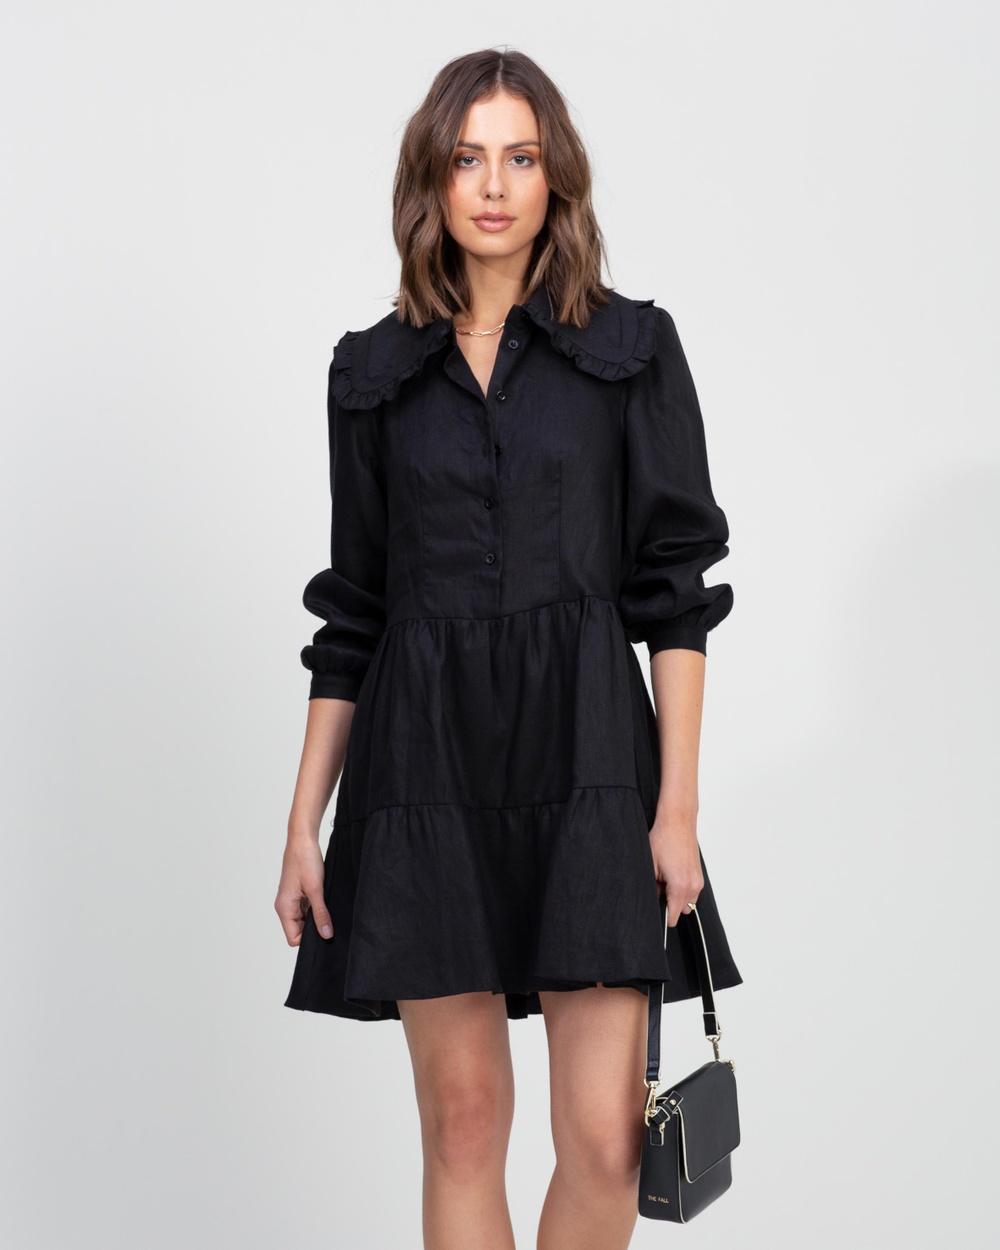 AERE Linen Collared Puff Sleeve Mini Dress Dresses Black